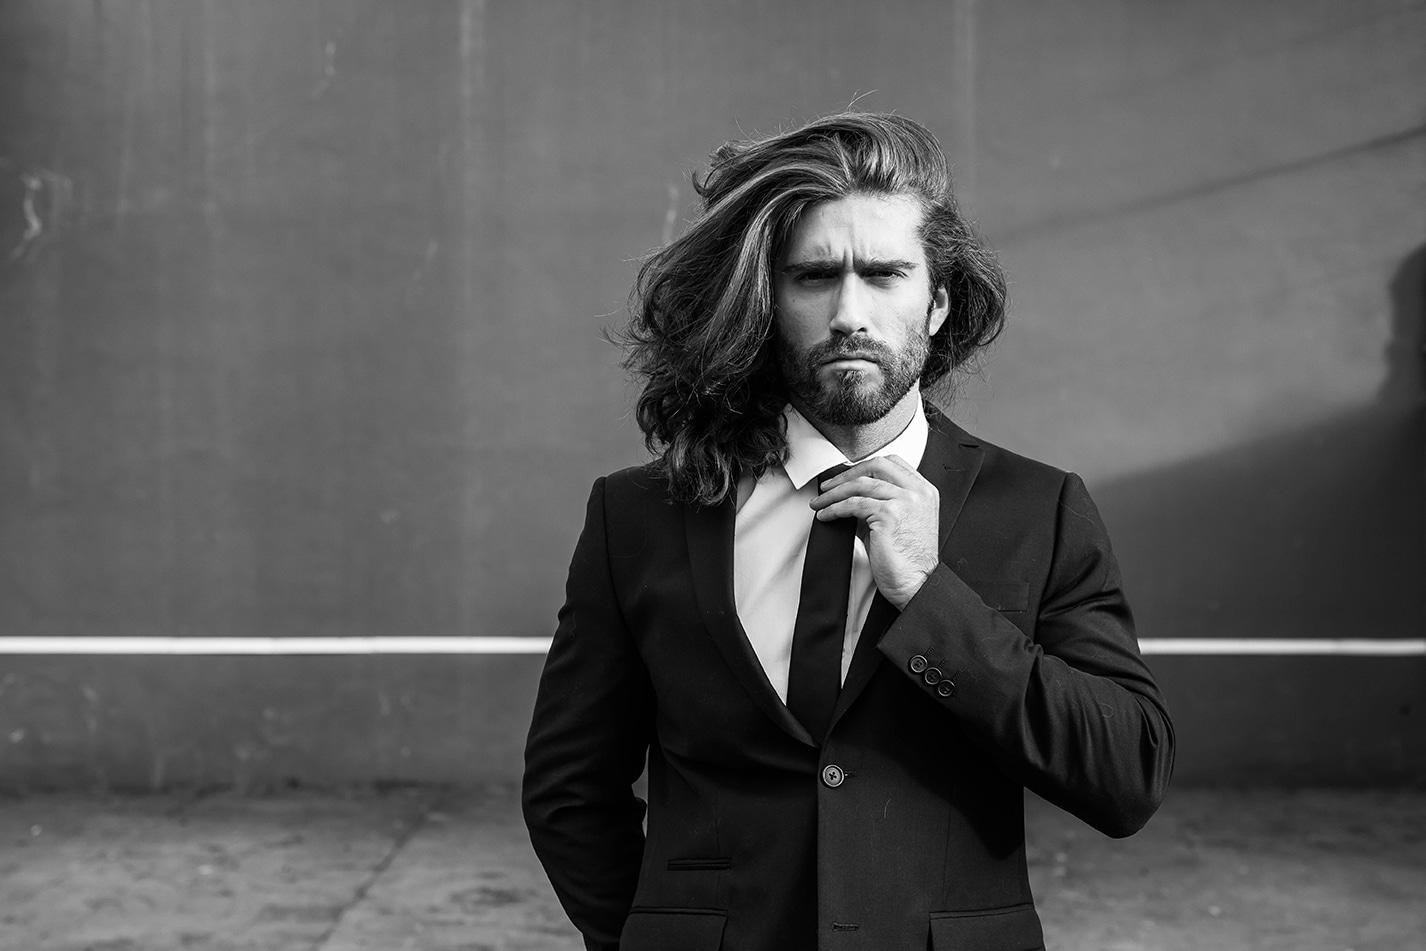 cheveux longs hommes entretenir